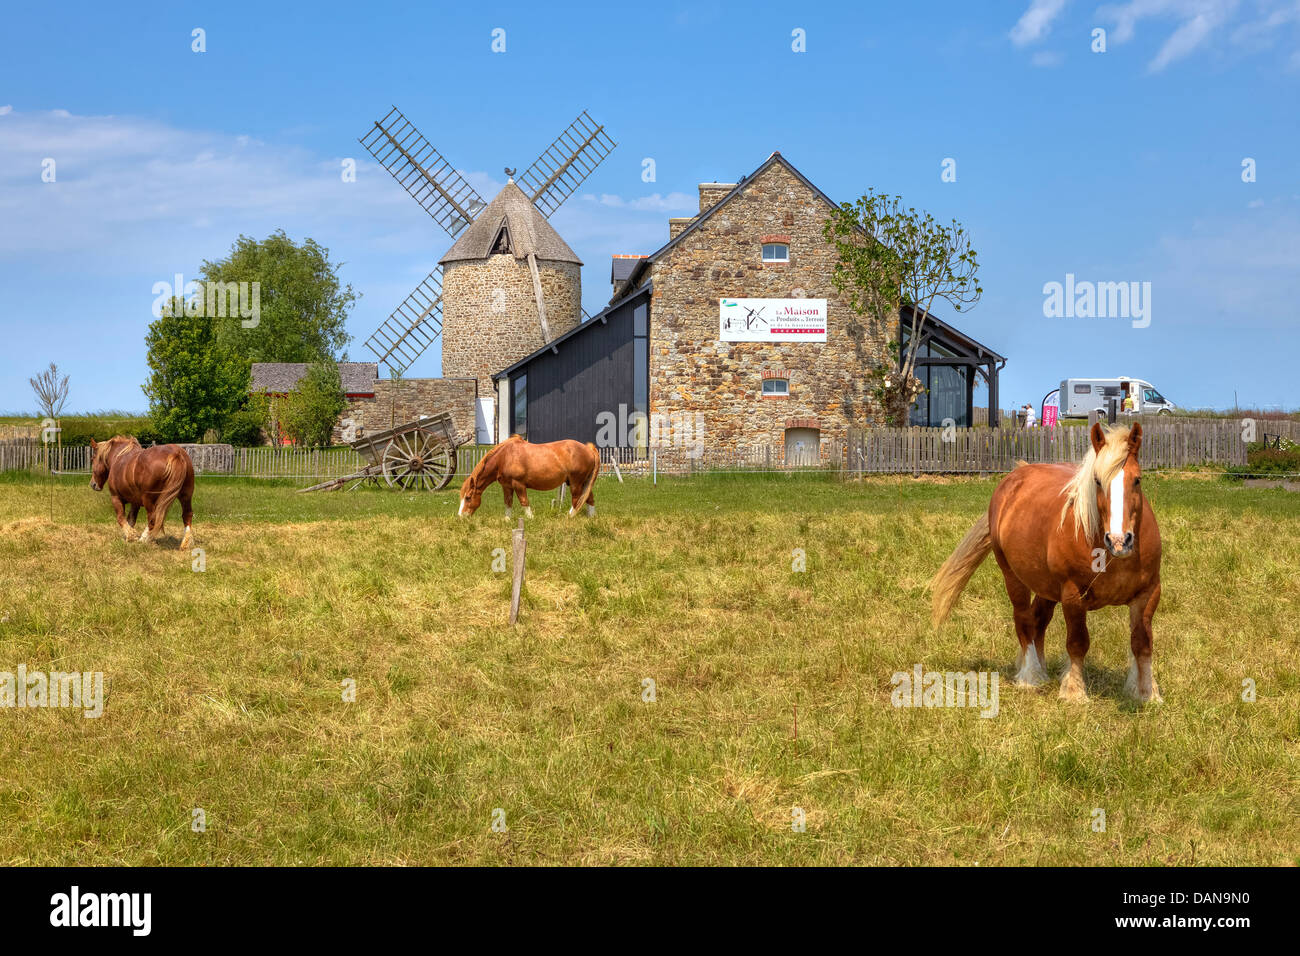 mill in Cherrueix, Brittany, France - Stock Image